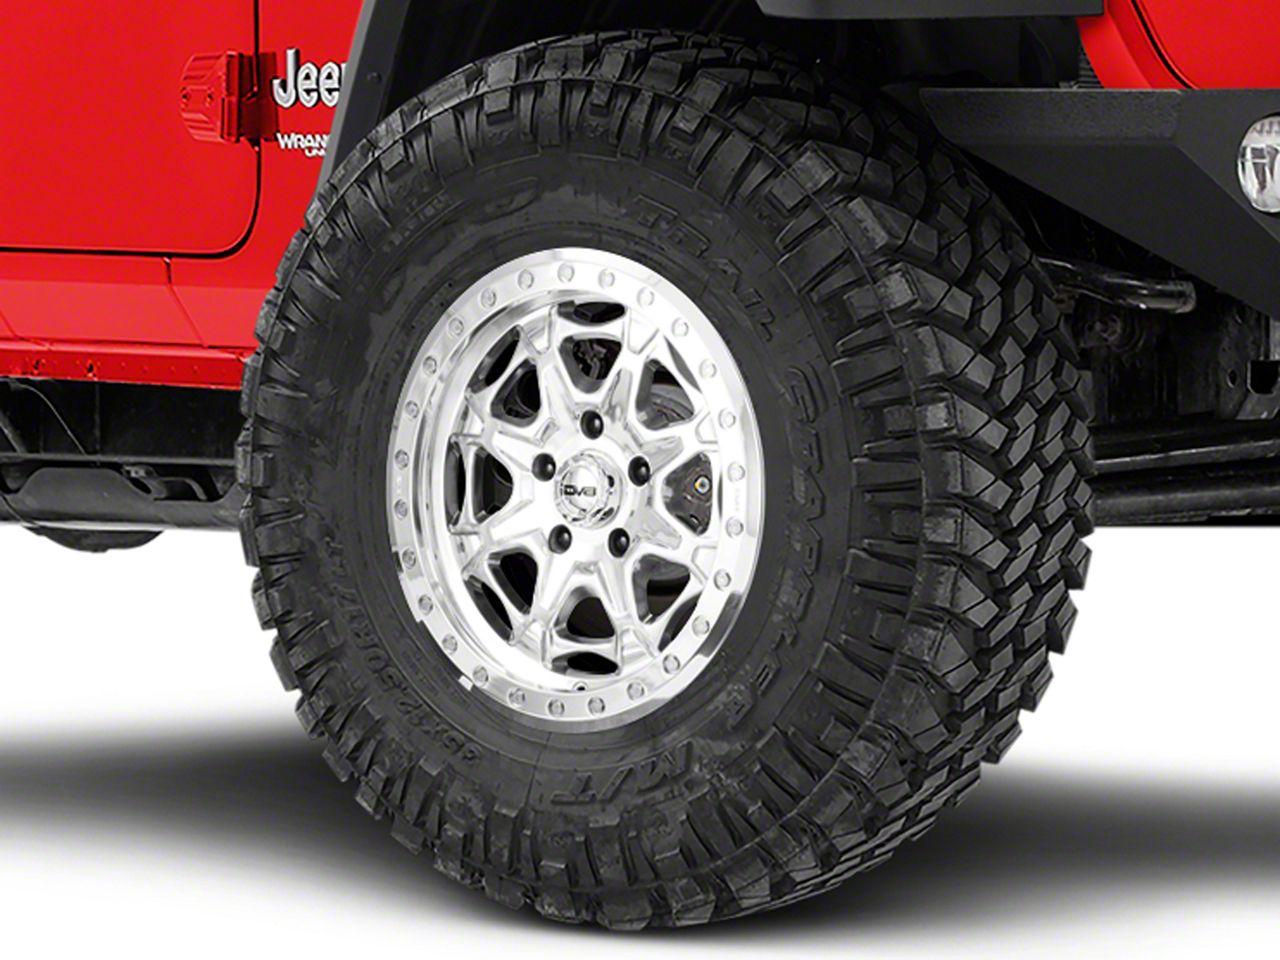 DV8 Off-Road Beadlock Polished Wheel - 17x8.5 (18-19 Jeep Wrangler JL)